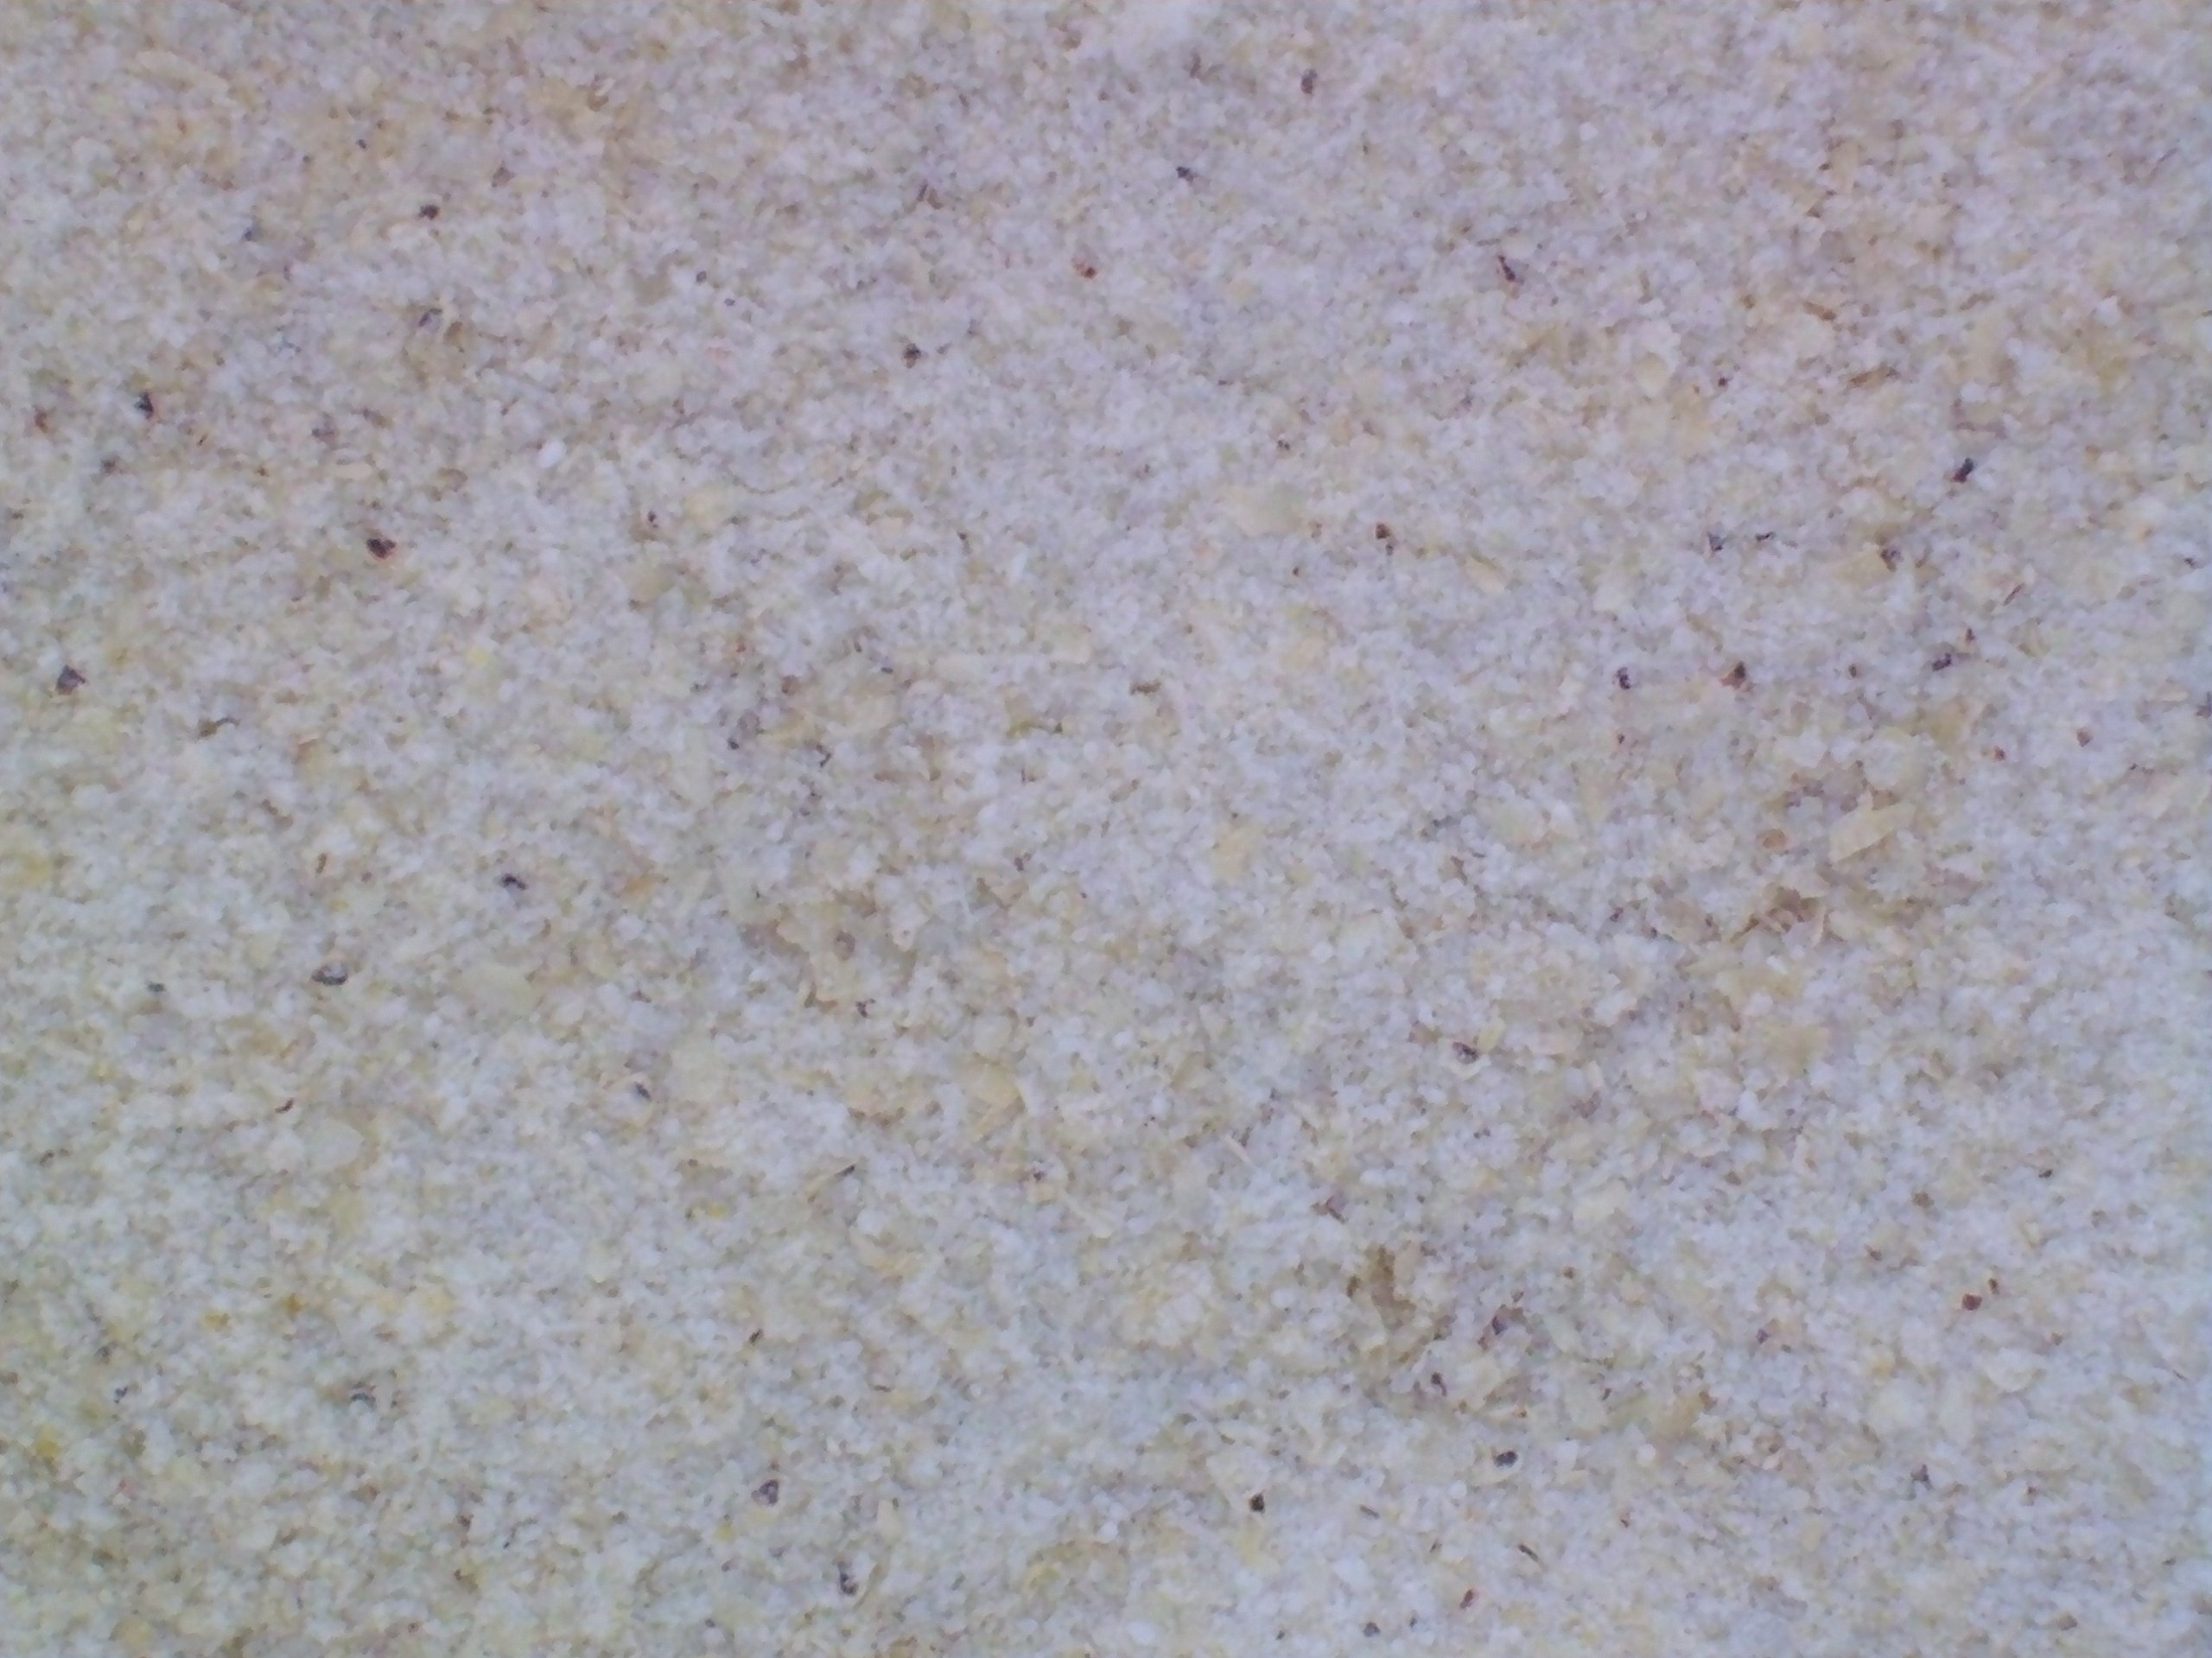 Popcorn flour, Organic, Stone Ground Fresh, Farmer Direct, 1 lb., non-GMO, IP